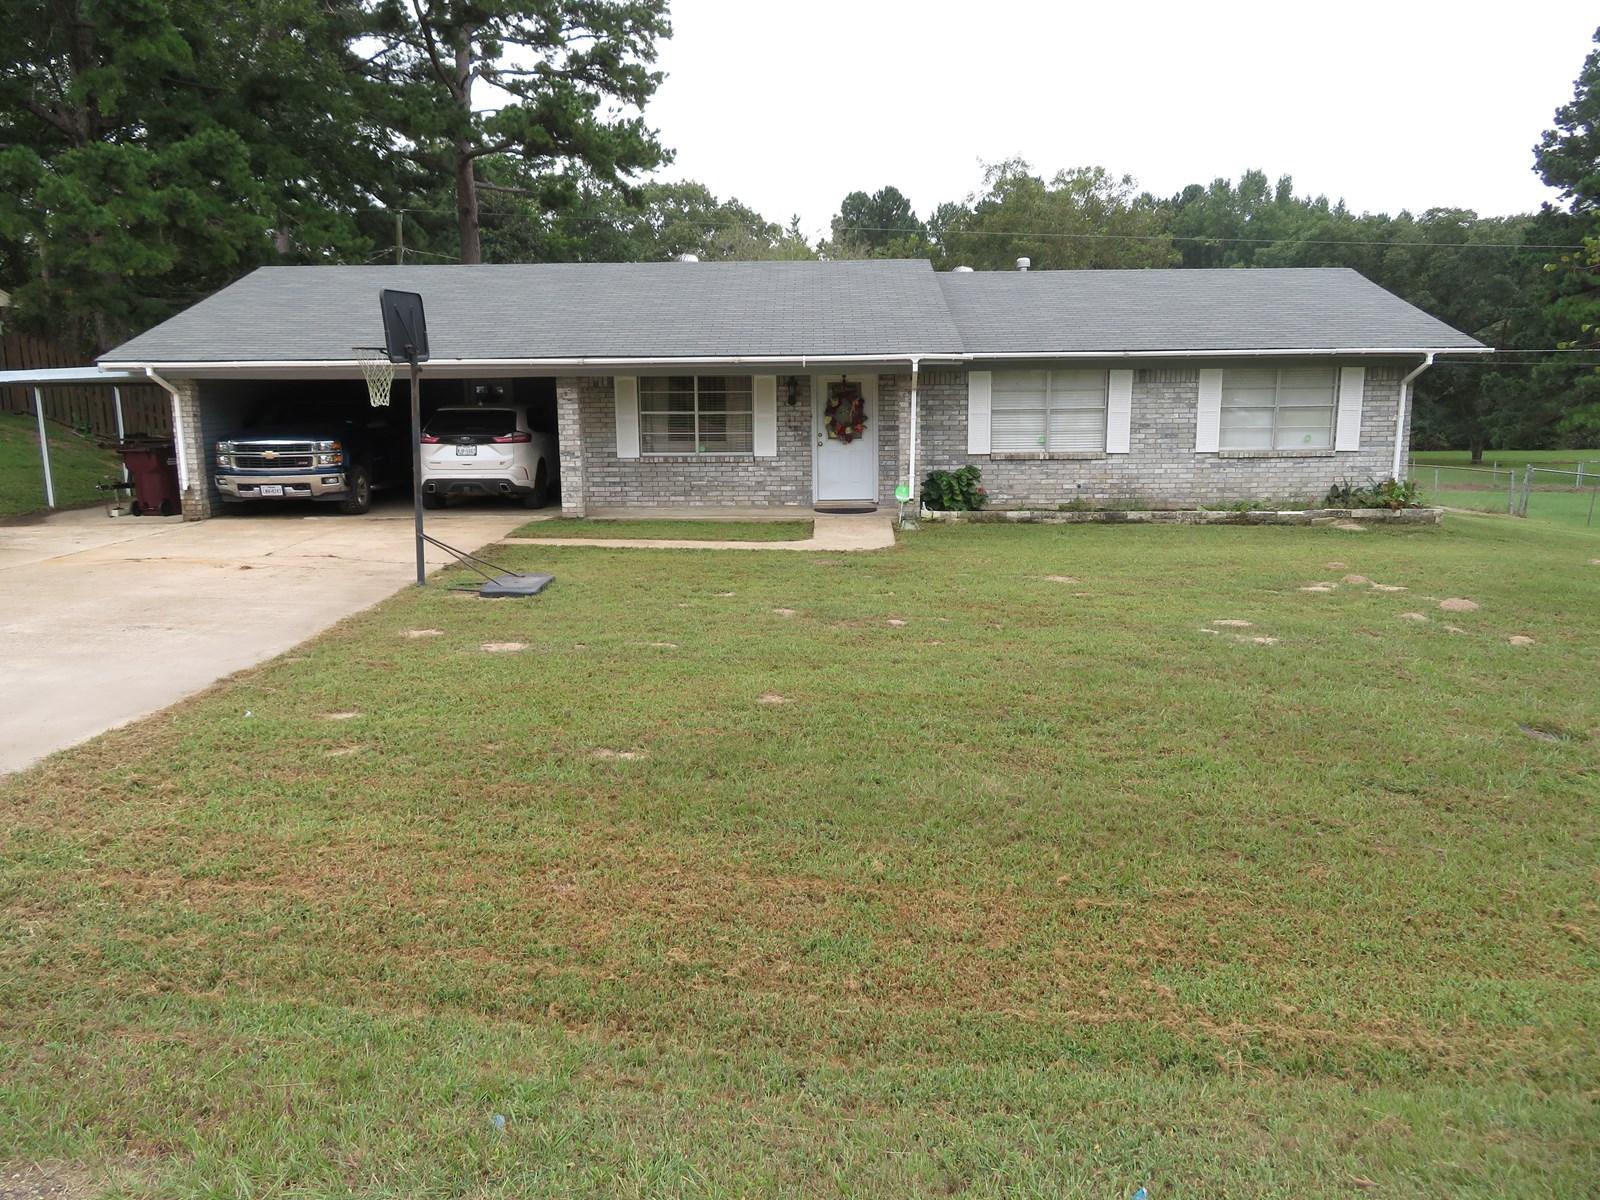 Home for Sale in Atlanta, Texas